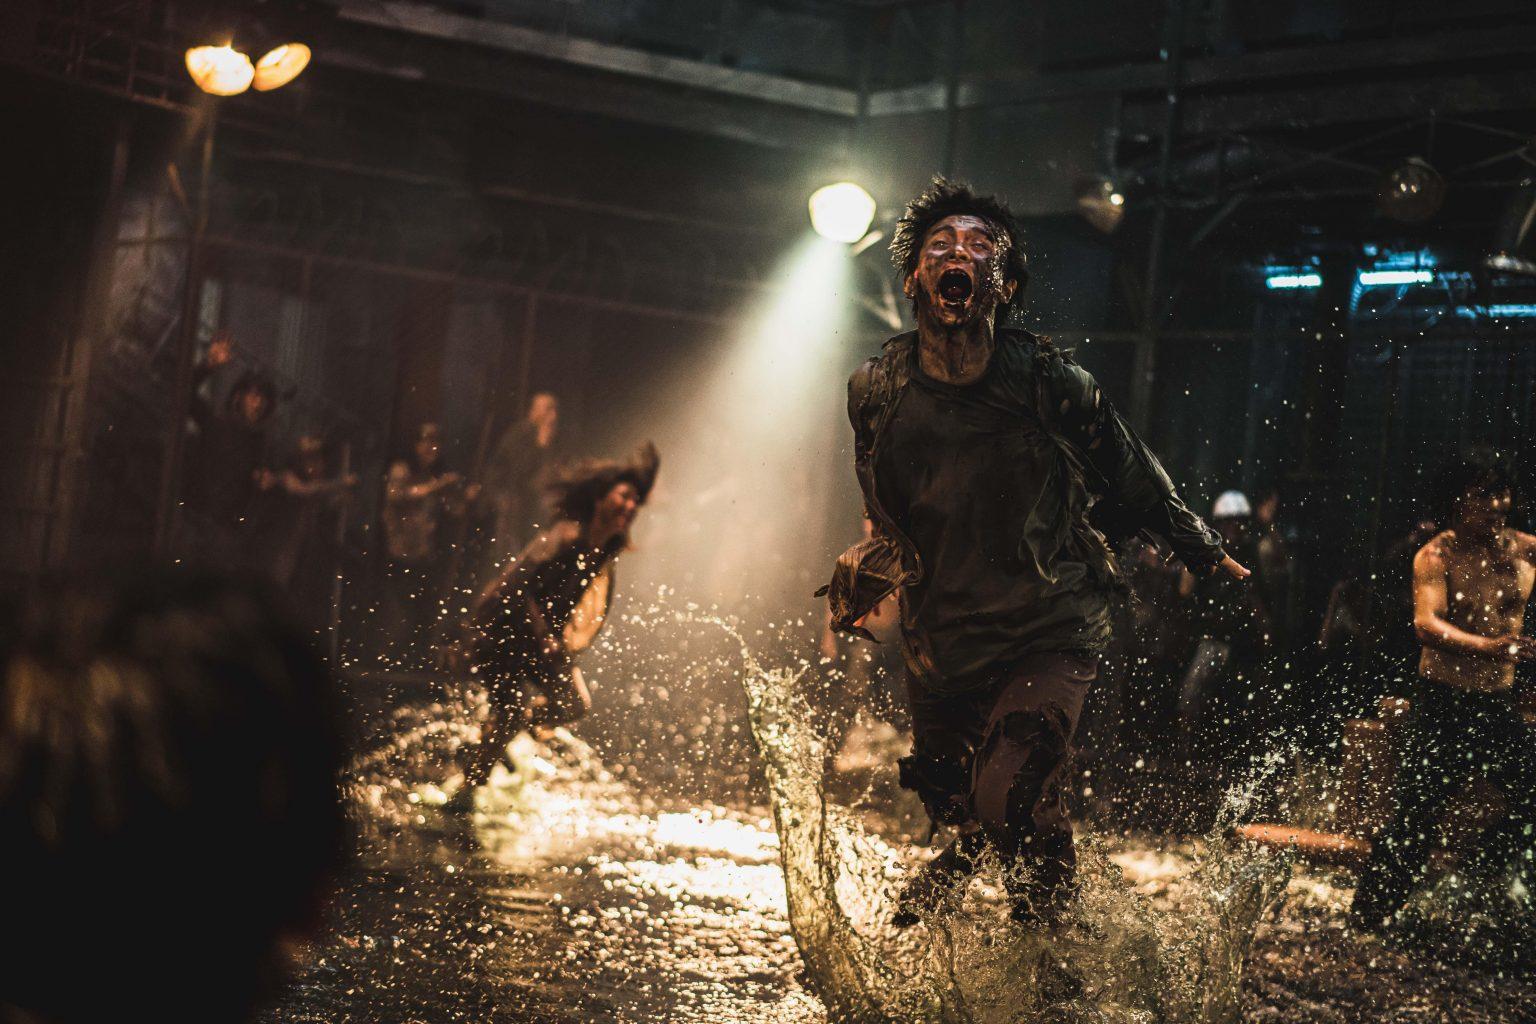 peninsula 1536x1024 1 - کارگردان دنباله Train to Busan: فیلم از Mad Max الهام گرفته شده است